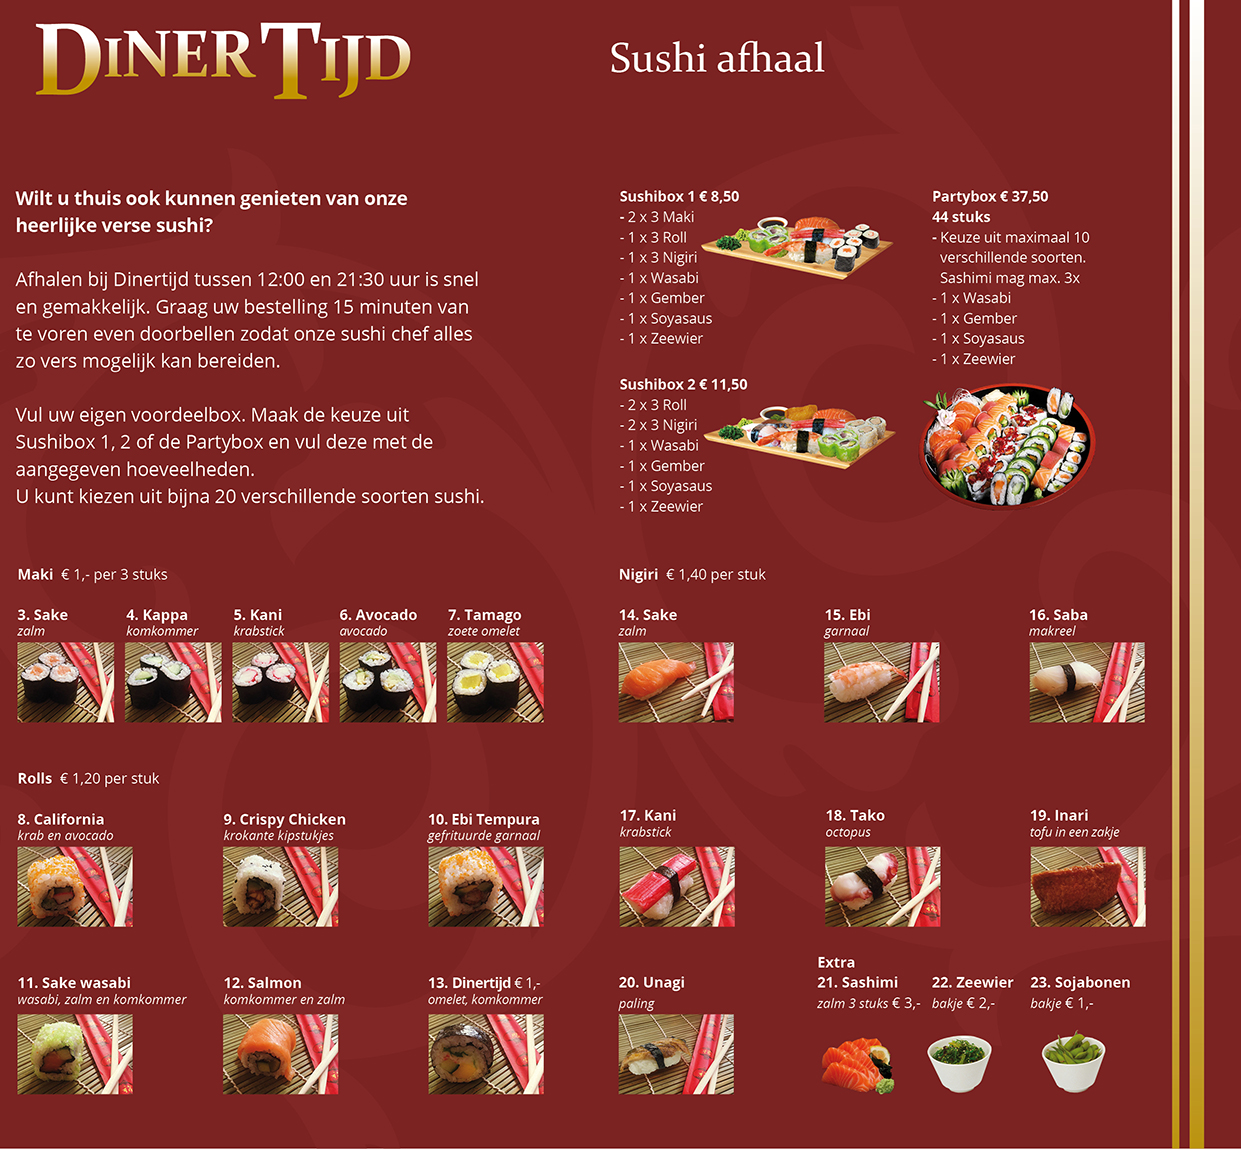 0161_0048_sushi poster web